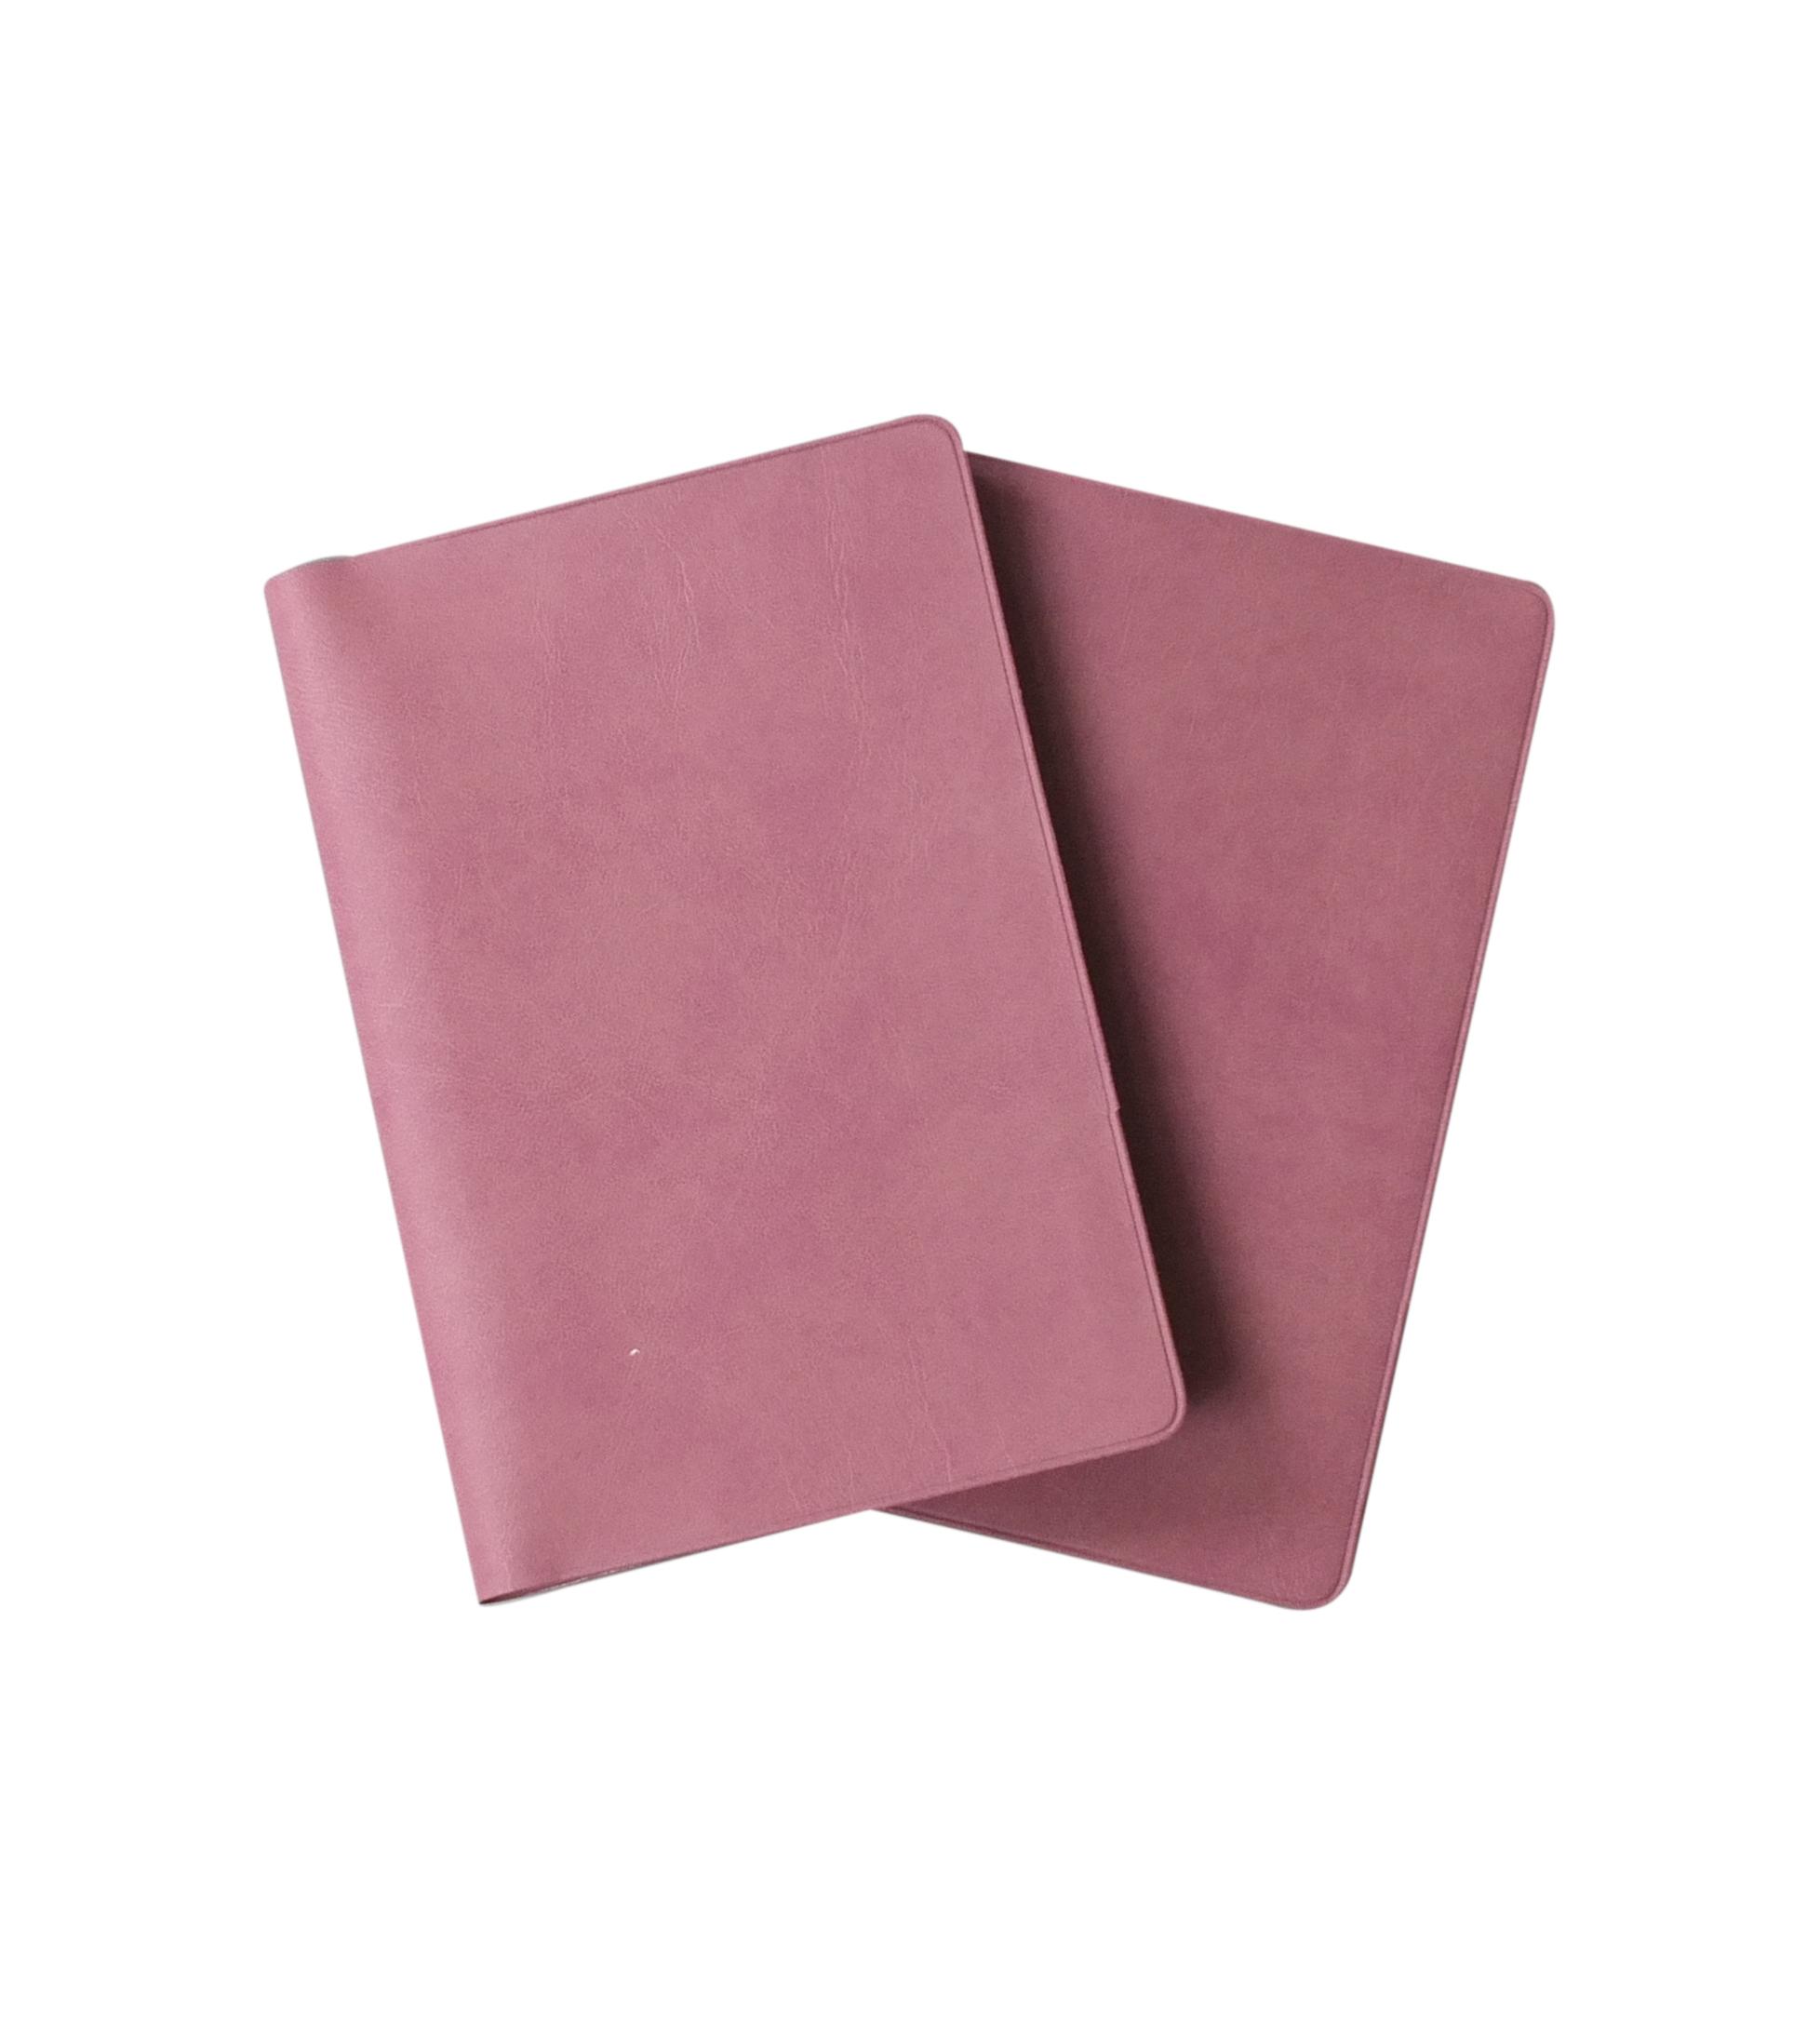 magenta covers